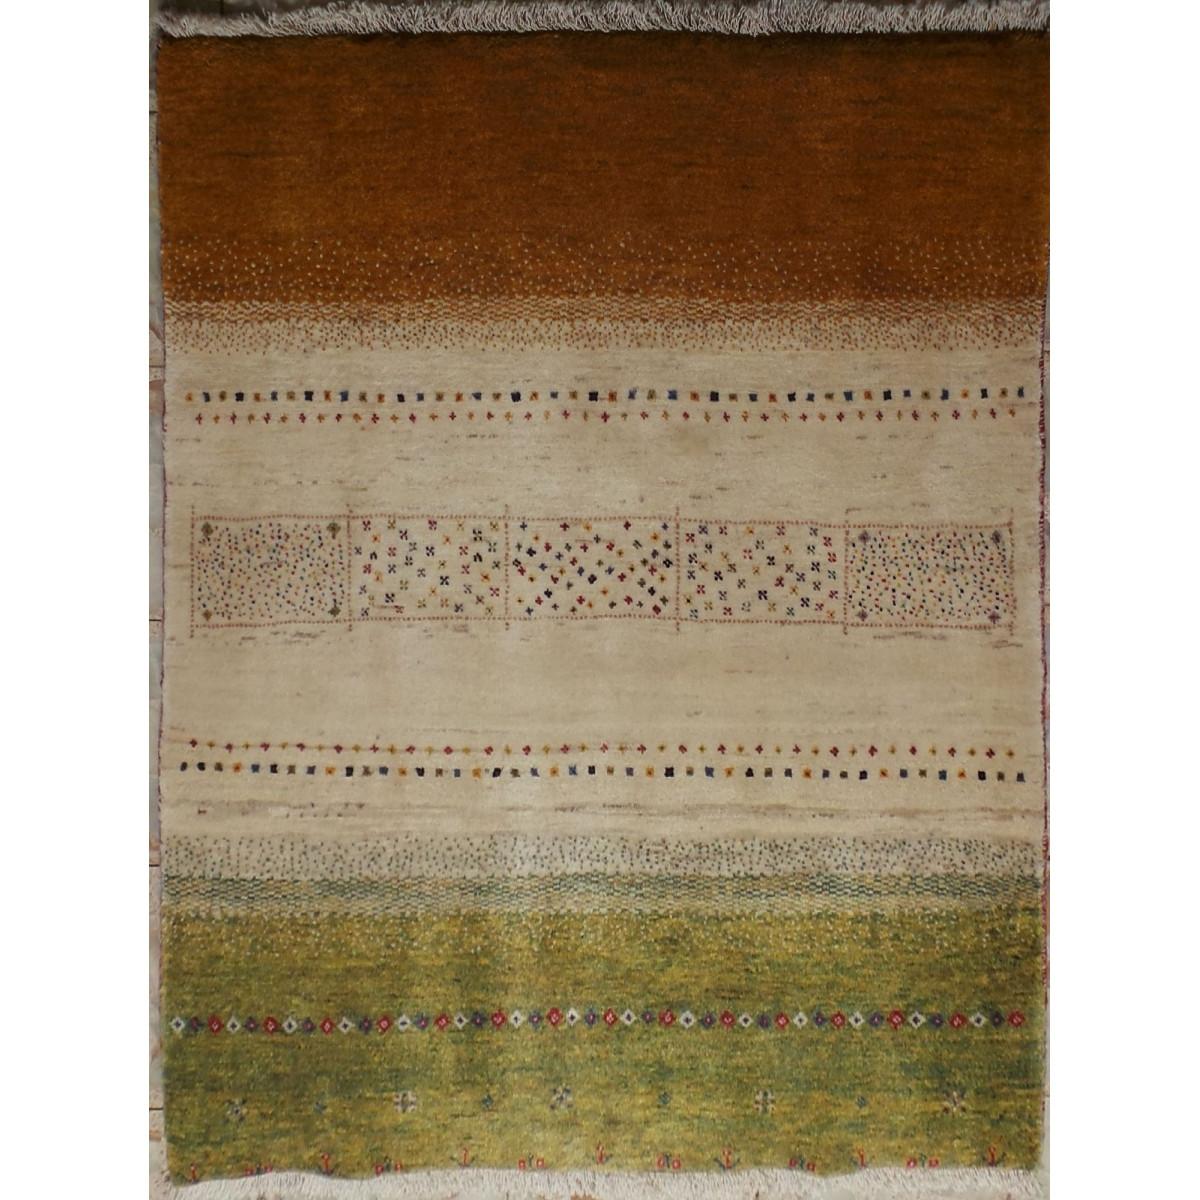 Persian Wool Gabbeh Rug - PRG013